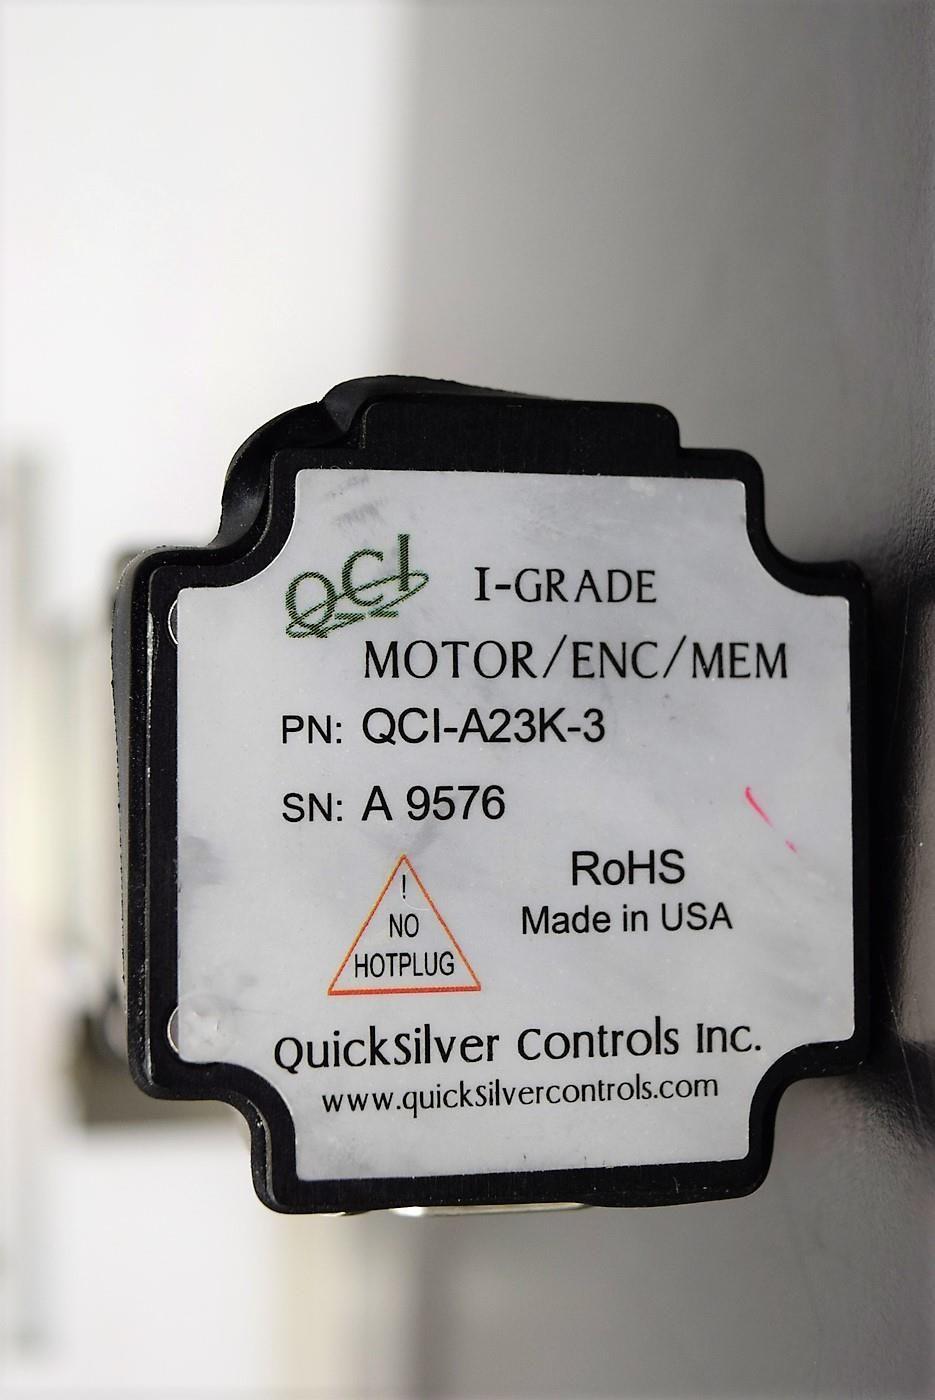 BD Innova Microbiology Processor Motorized Plate Positioner A1BRP220-2 Warranty